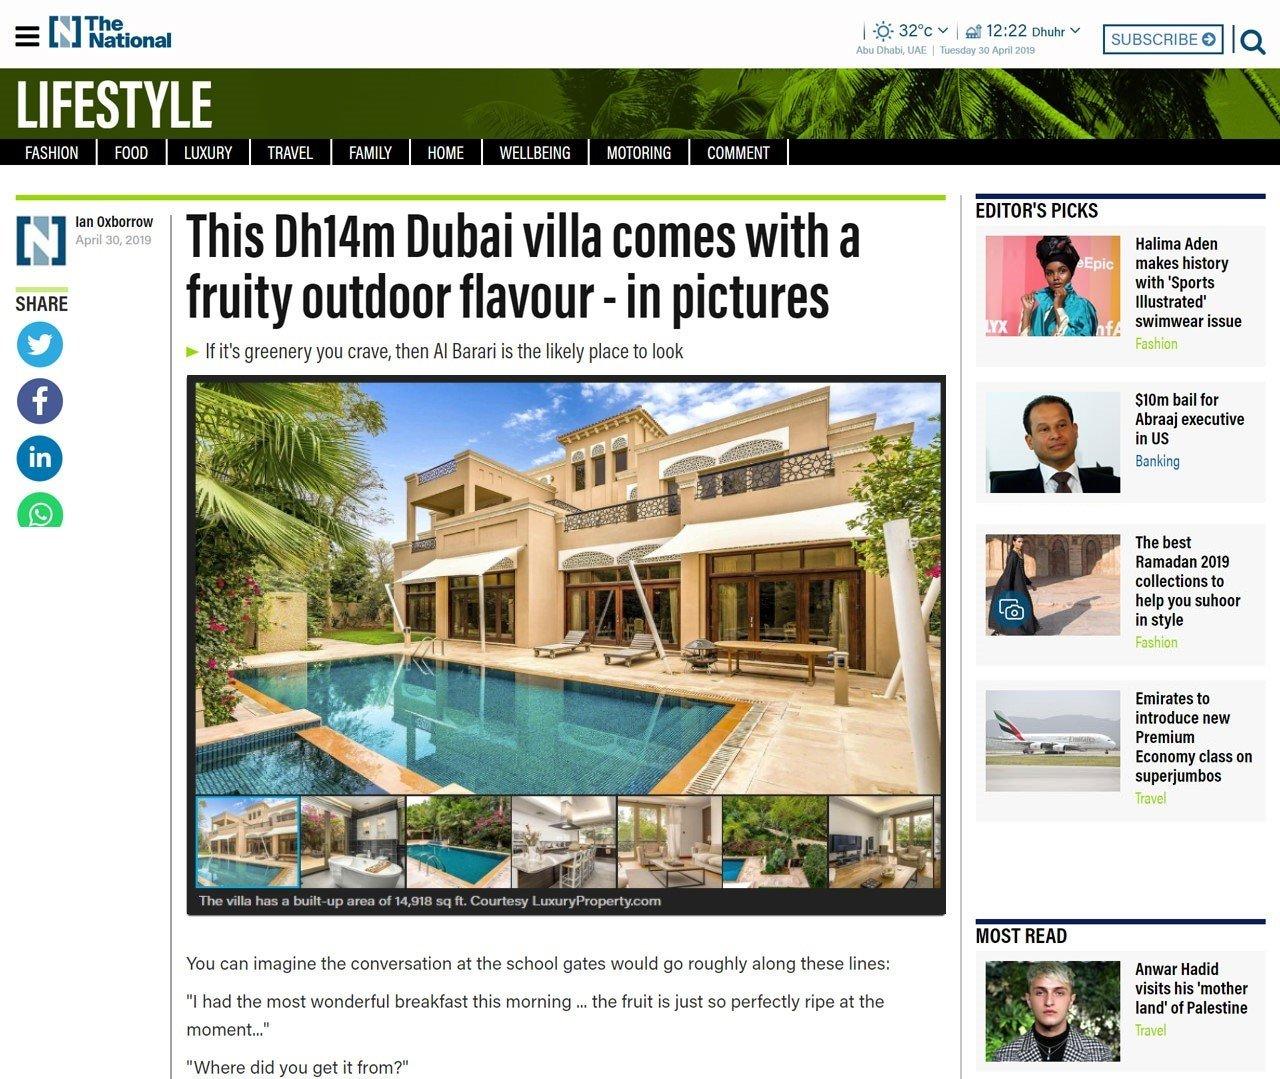 Dh14m Dubai villa comes with a fruity outdoor flavour